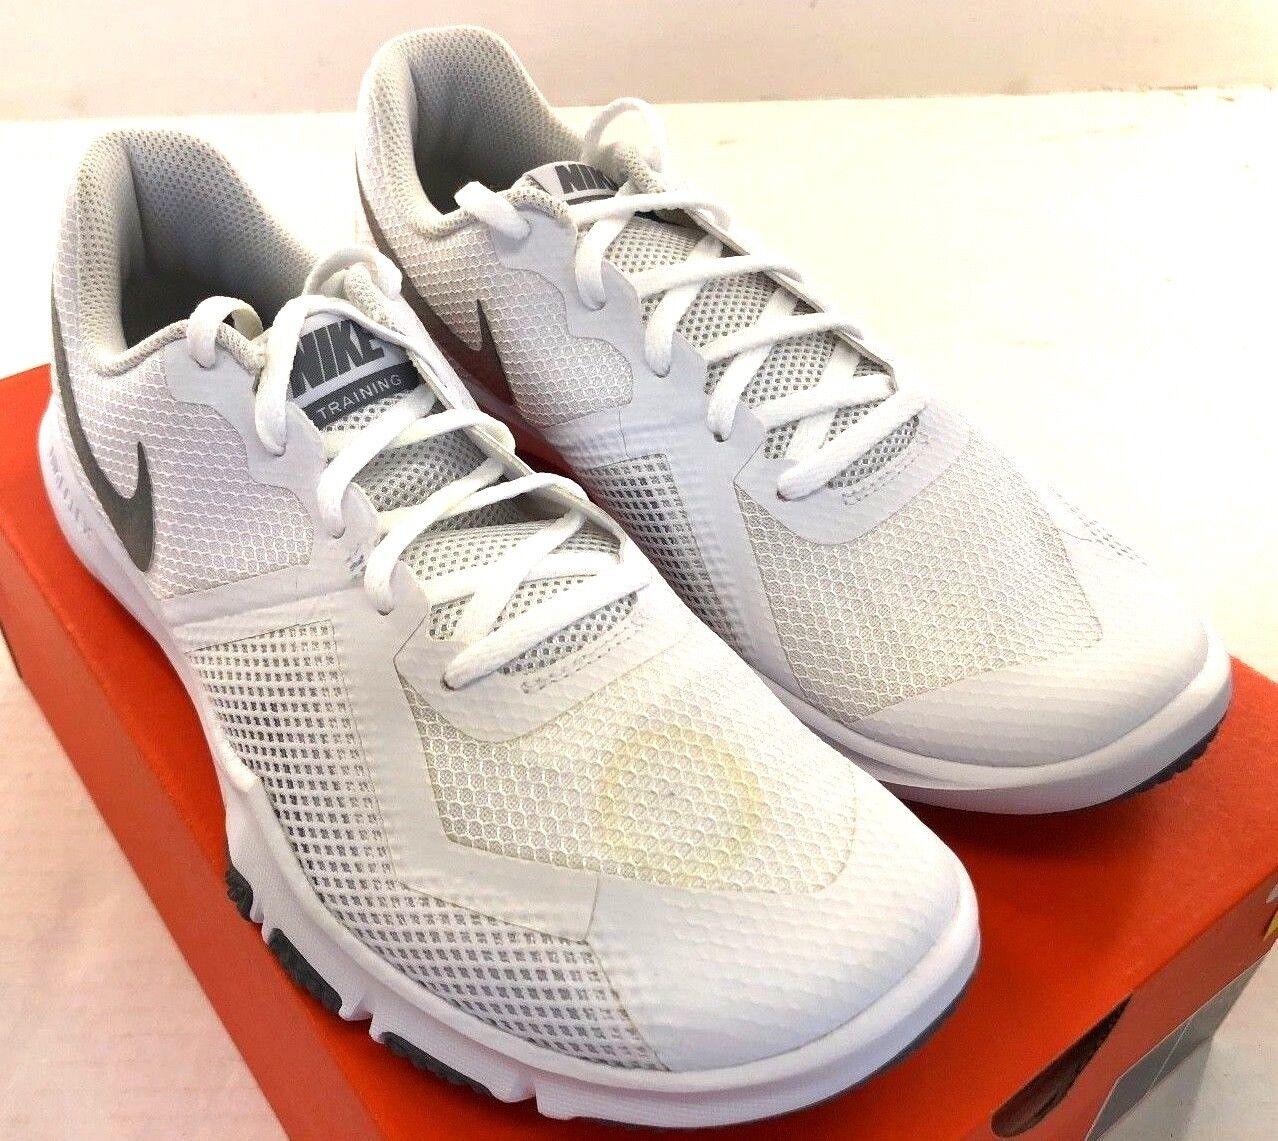 Nike flex control ii männer laufschuhe 924204-100 weißes mesh nwd